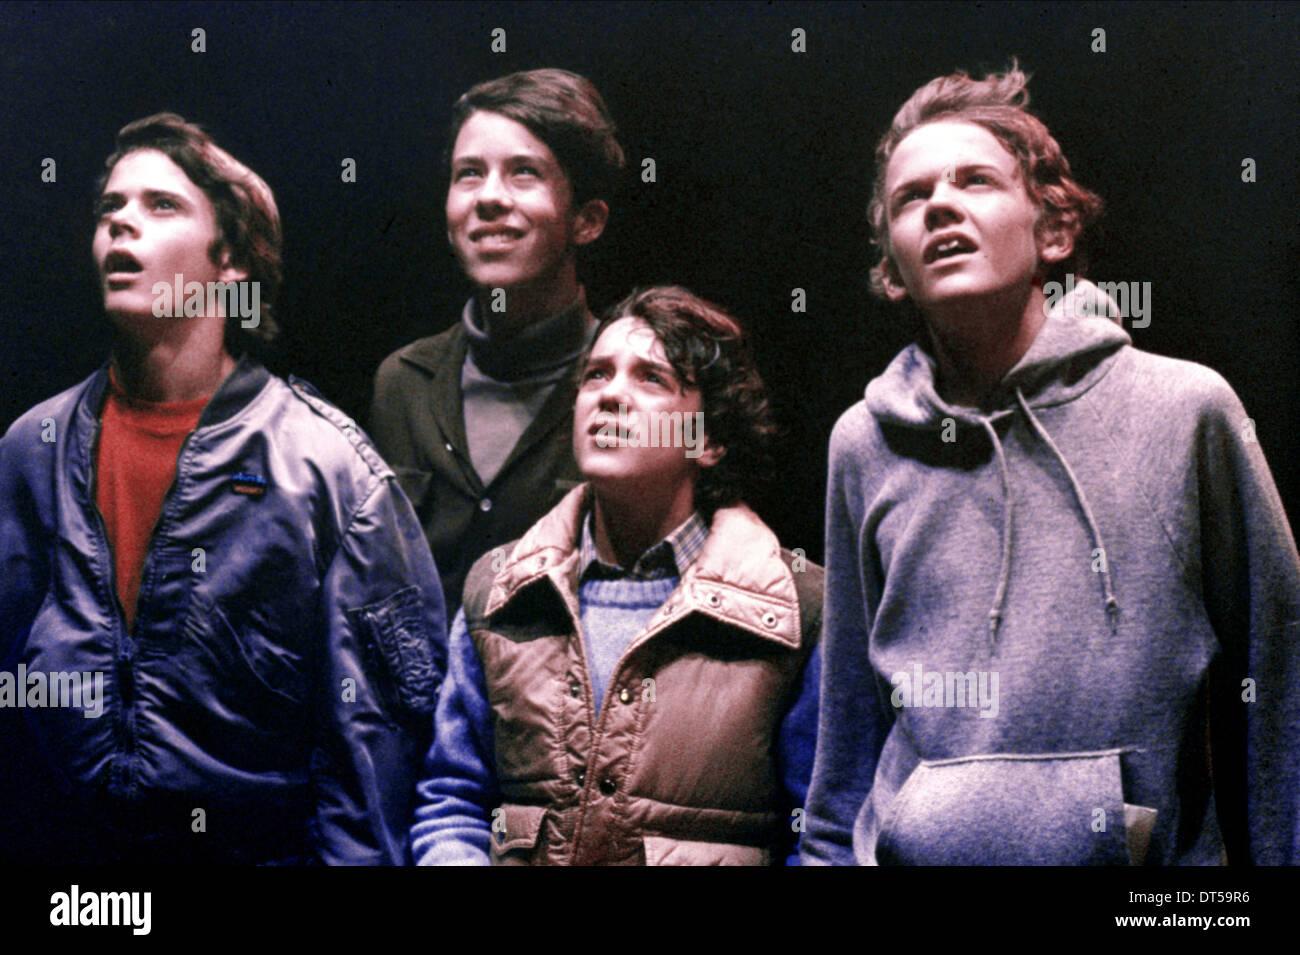 C. THOMAS HOWELL, SEAN FRYE, ROBERT MACNAUGHTON, E.T. THE EXTRA-TERRESTRIAL, 1982 - Stock Image